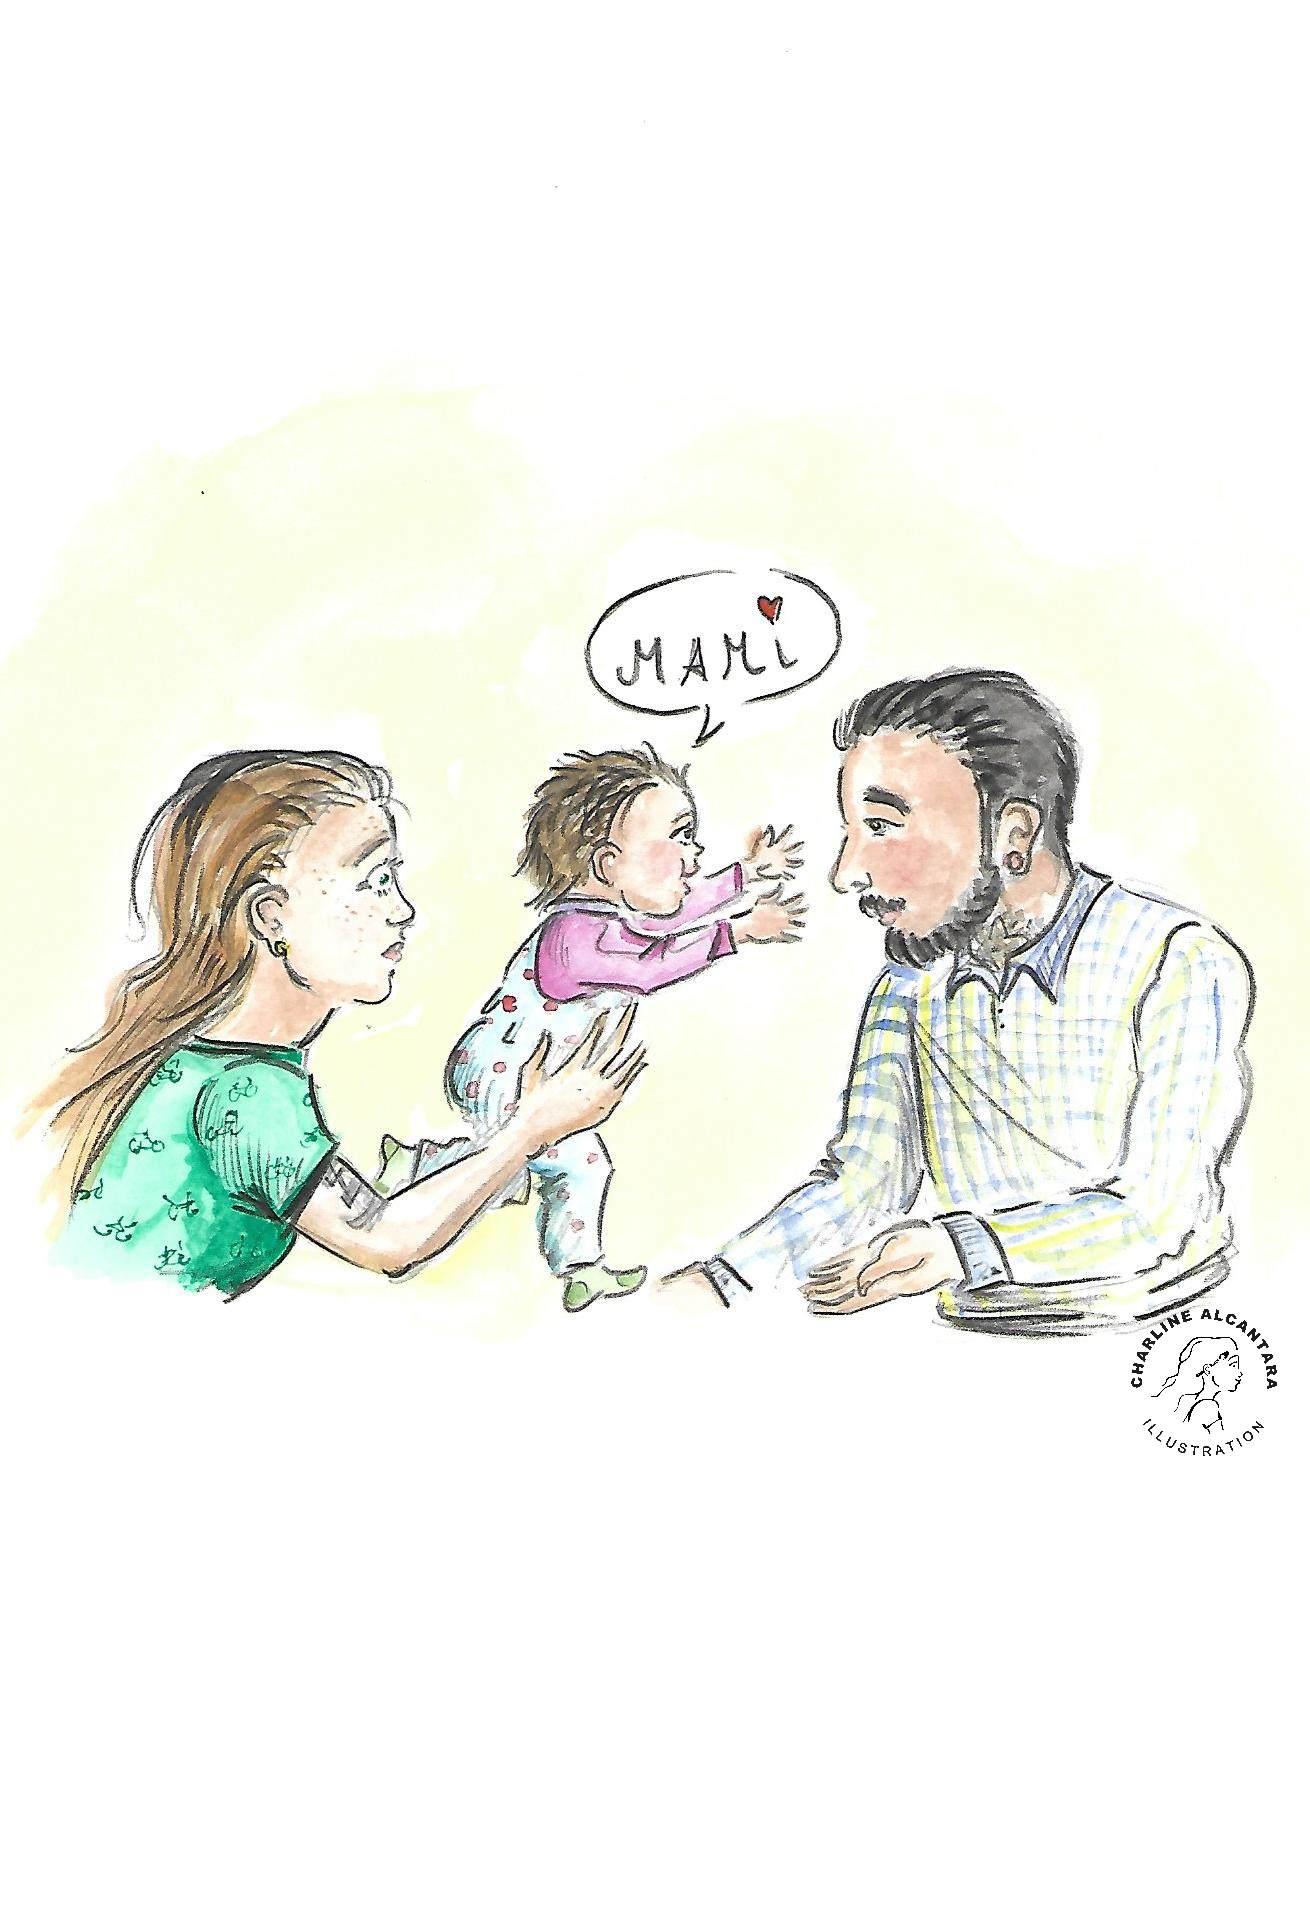 Kind auf mamas Arm will auf Papas Arm